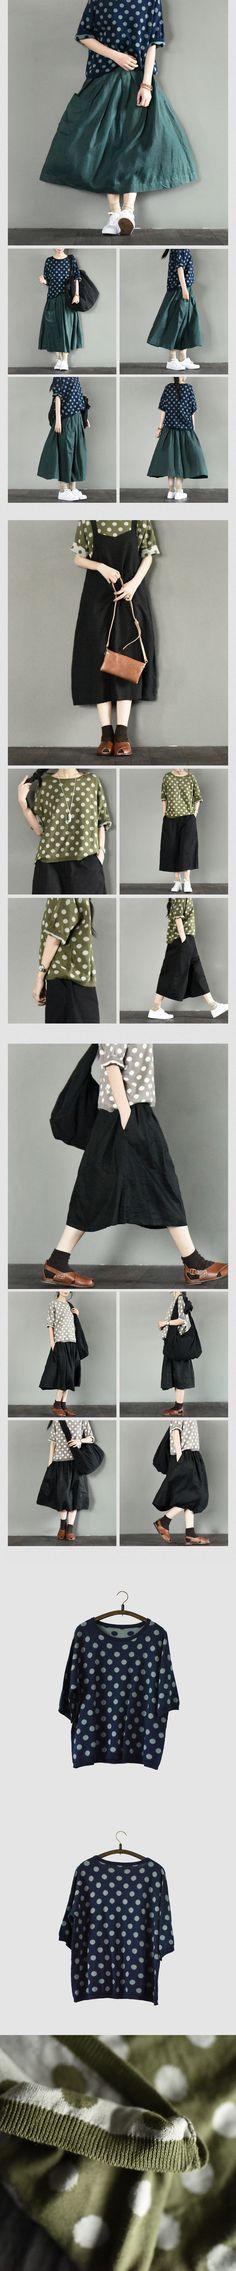 Three-colour Lovely Dot Summer T-shirt Knitwear Cotton Top  Blouse Women Clothes  by Fantasylinen